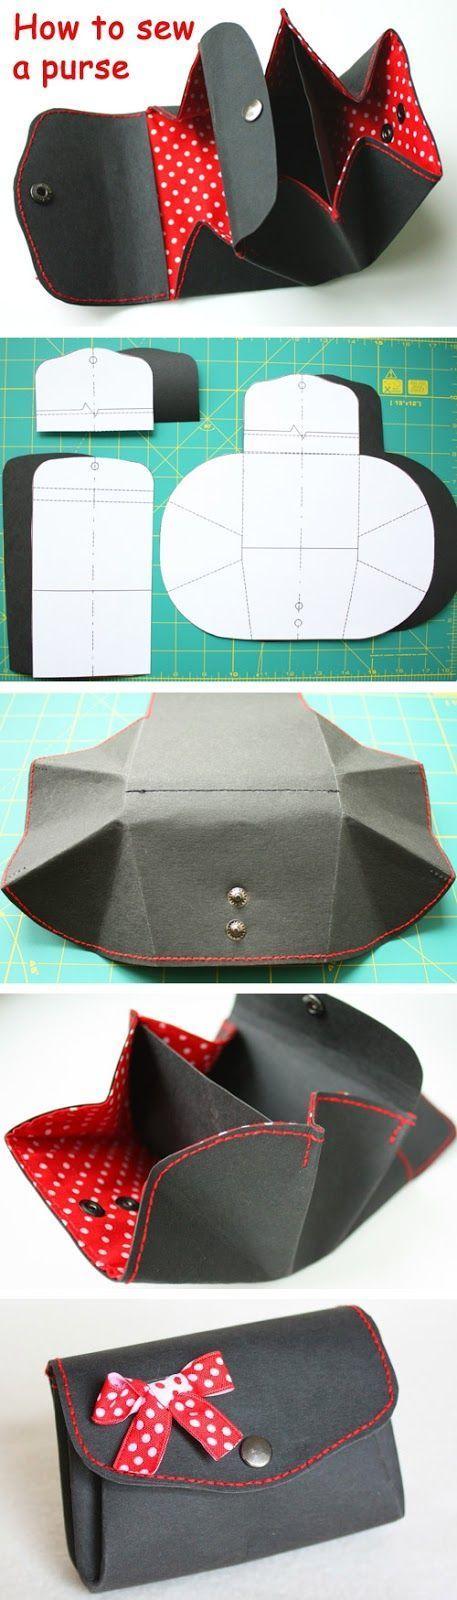 Coin purse made from Kraft-Tex paper. DIY tutorial in pictures.  http://www.handmadiya.com/2015/10/purse-kraft-tex-fabric-tutorial.html